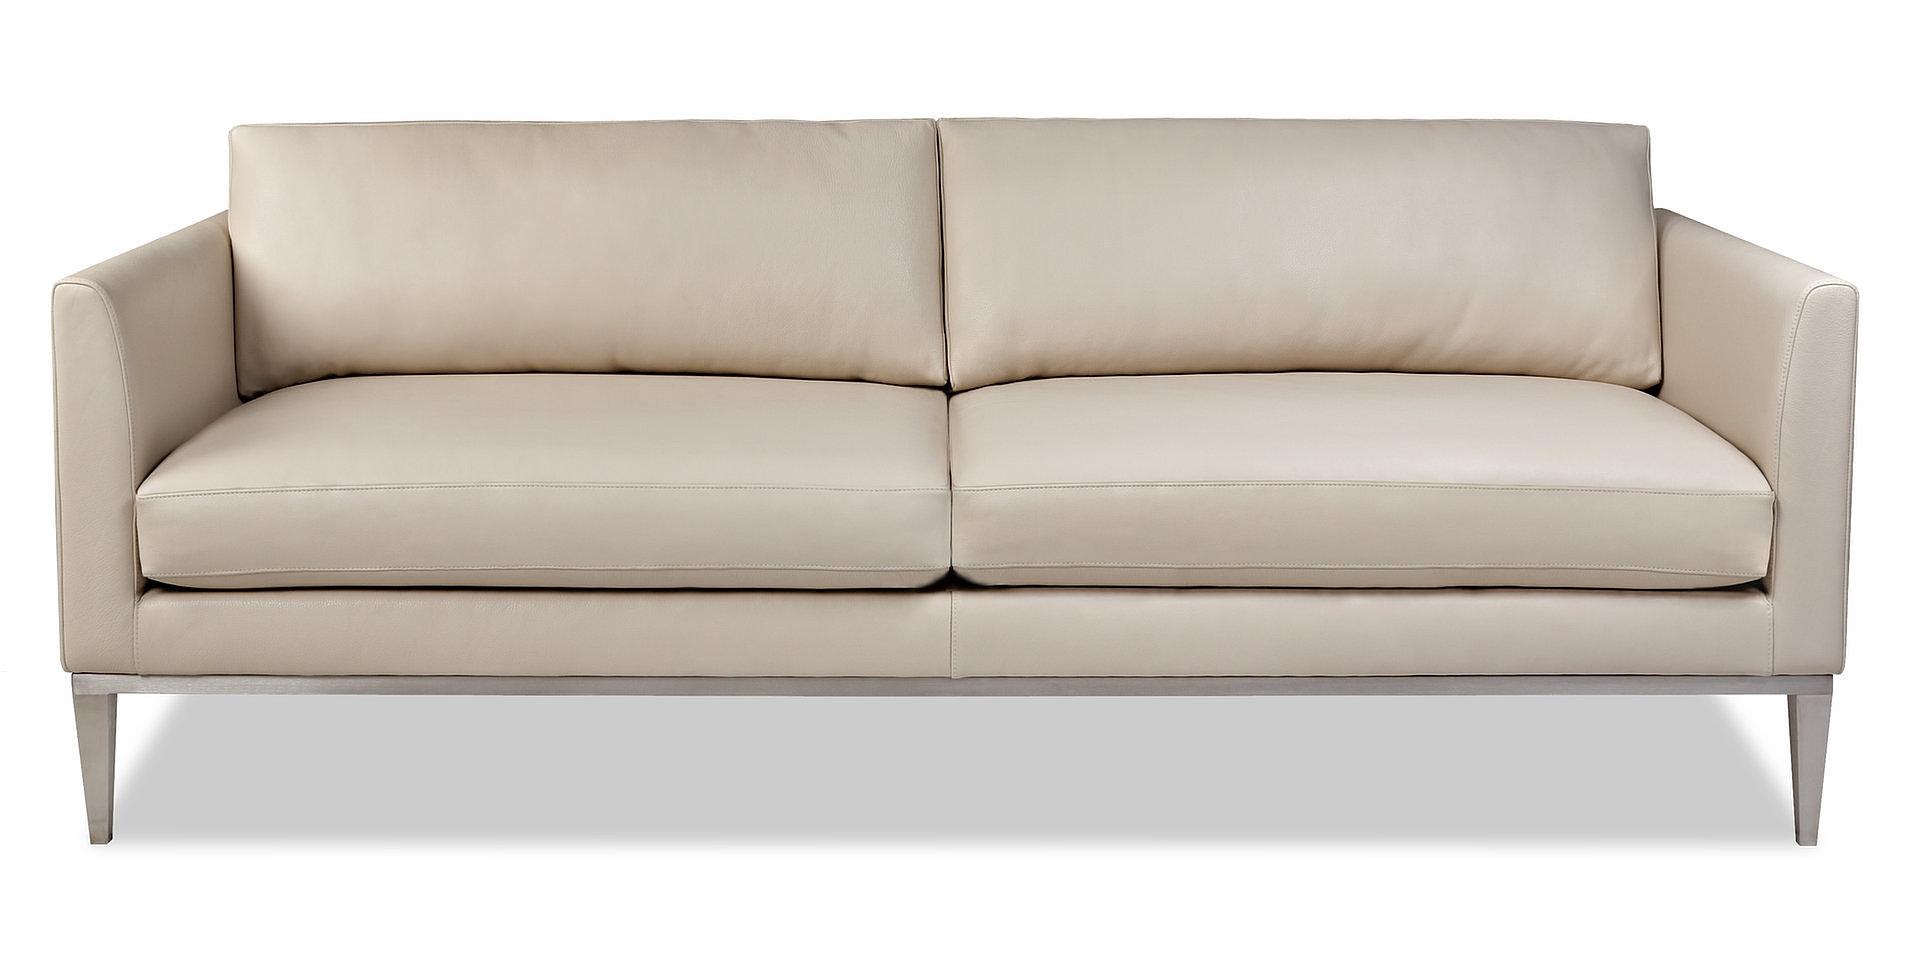 Domicilechicago Henley Sofa